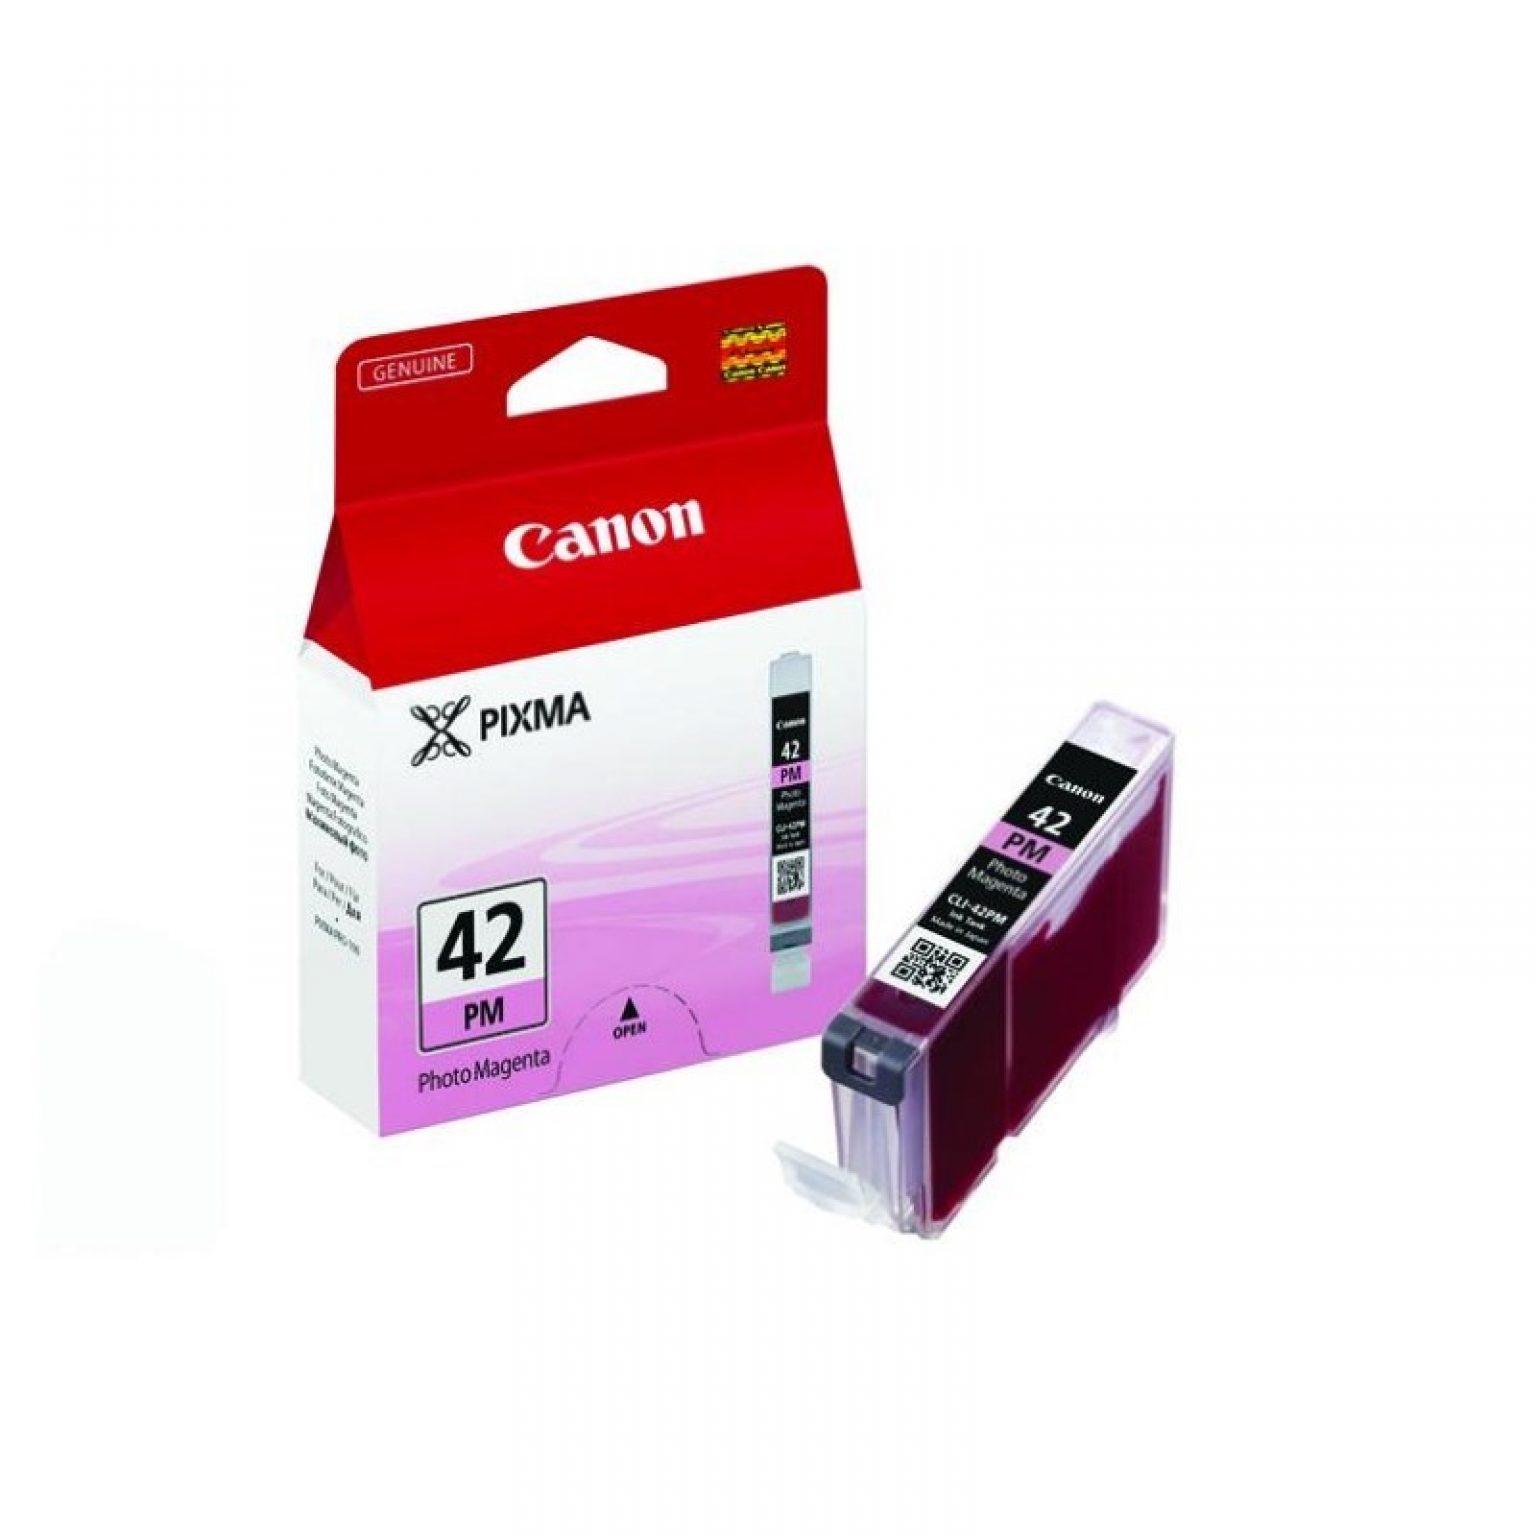 CANON - Ink Cartridge PGI-72 Photo Magenta for Pro-10 [PGI72PM]